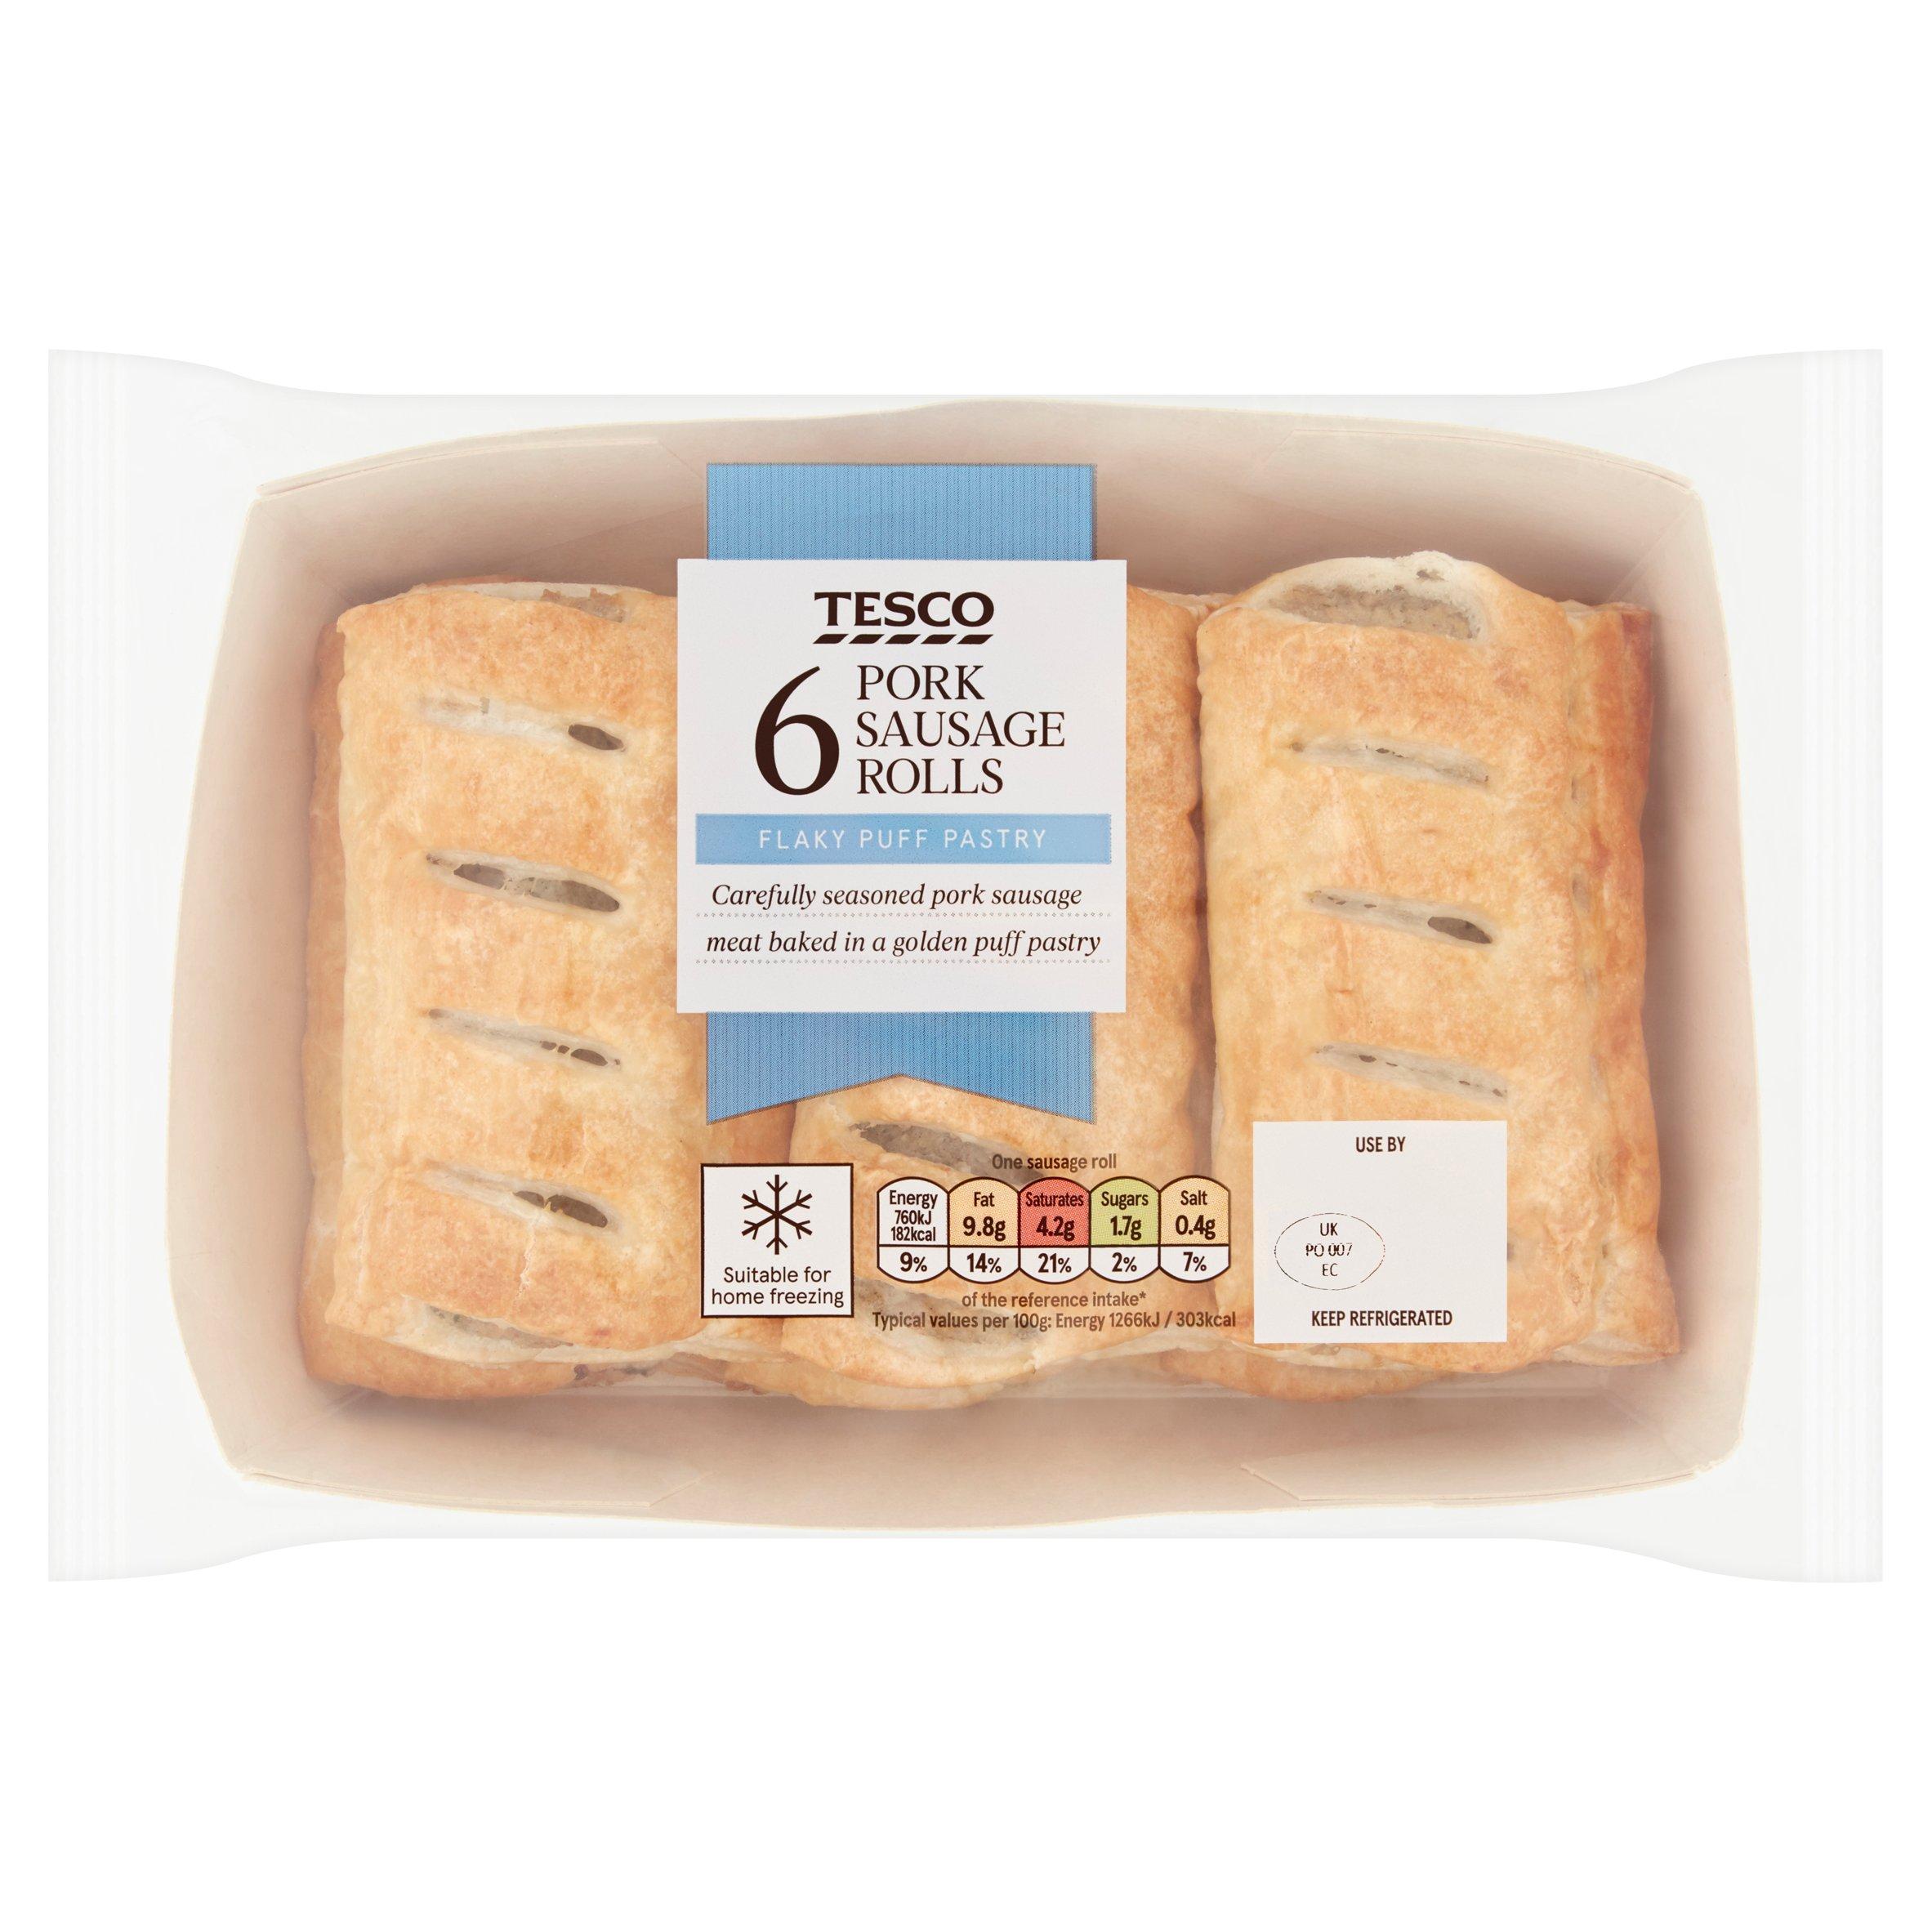 Tesco 6 Pack Sausage Rolls 360G